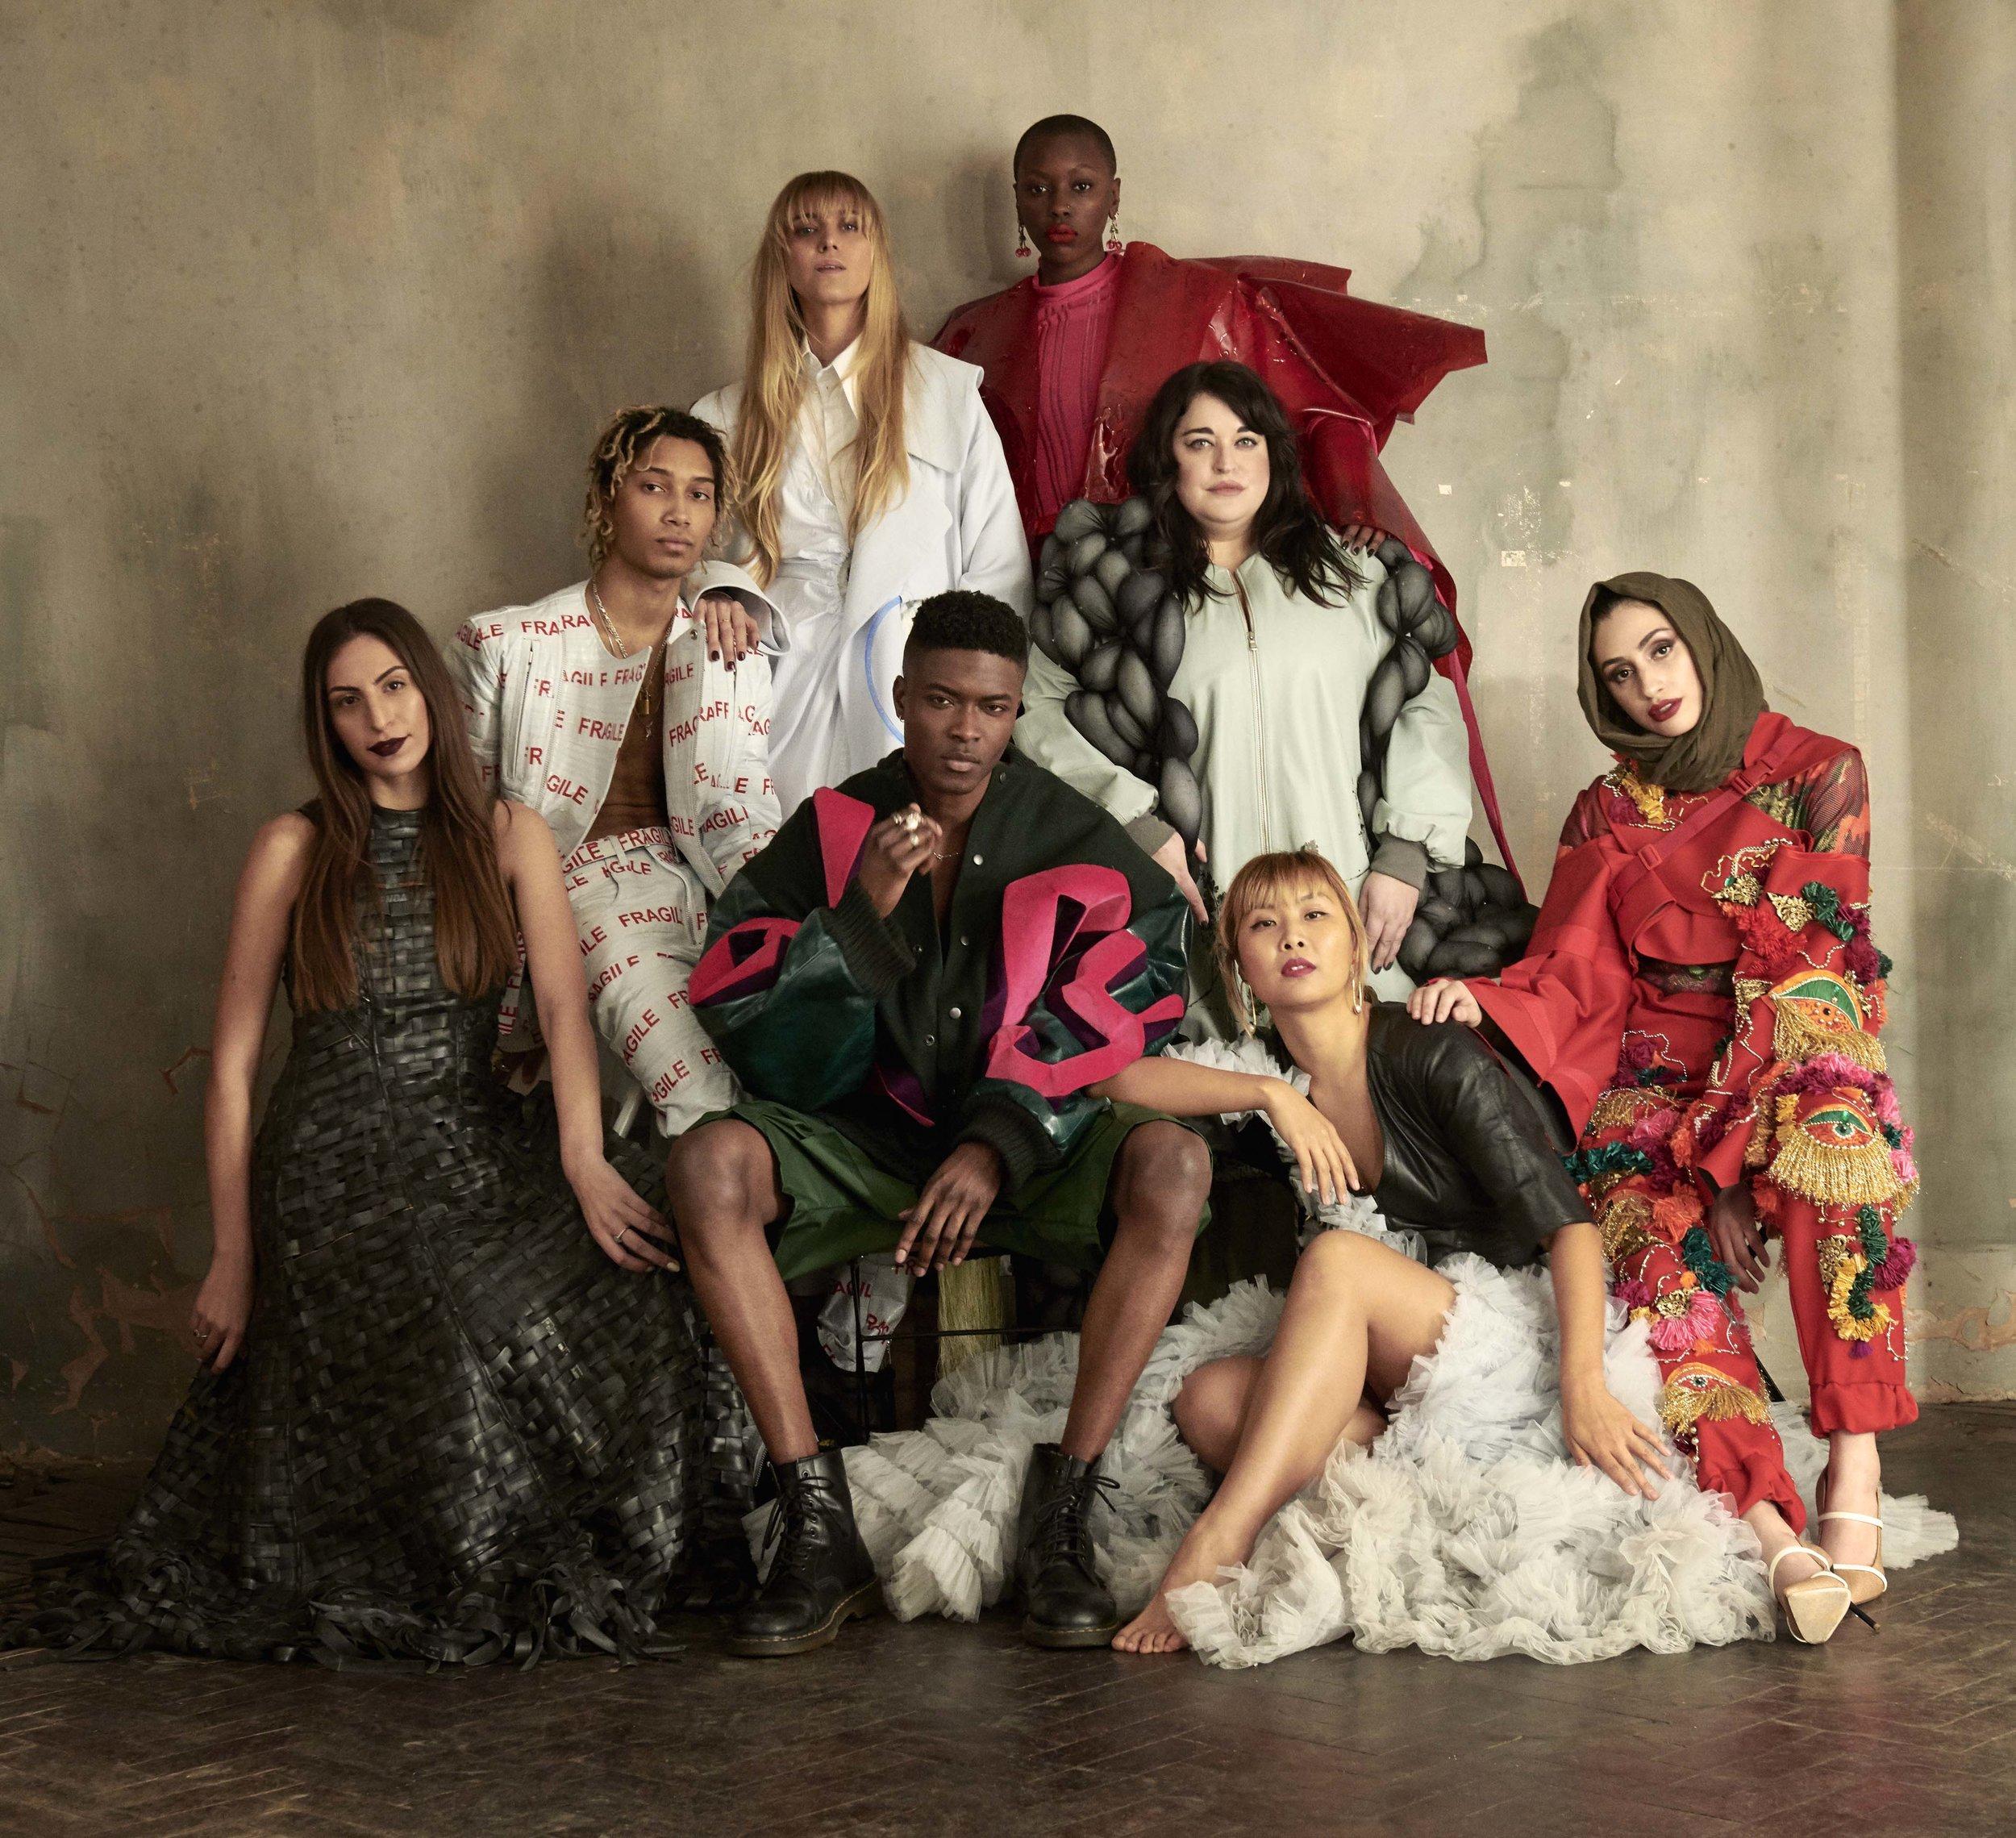 Rion Magazine - Graduate Fashion Week: 2018 Talent of Tomorrow17/05/2018